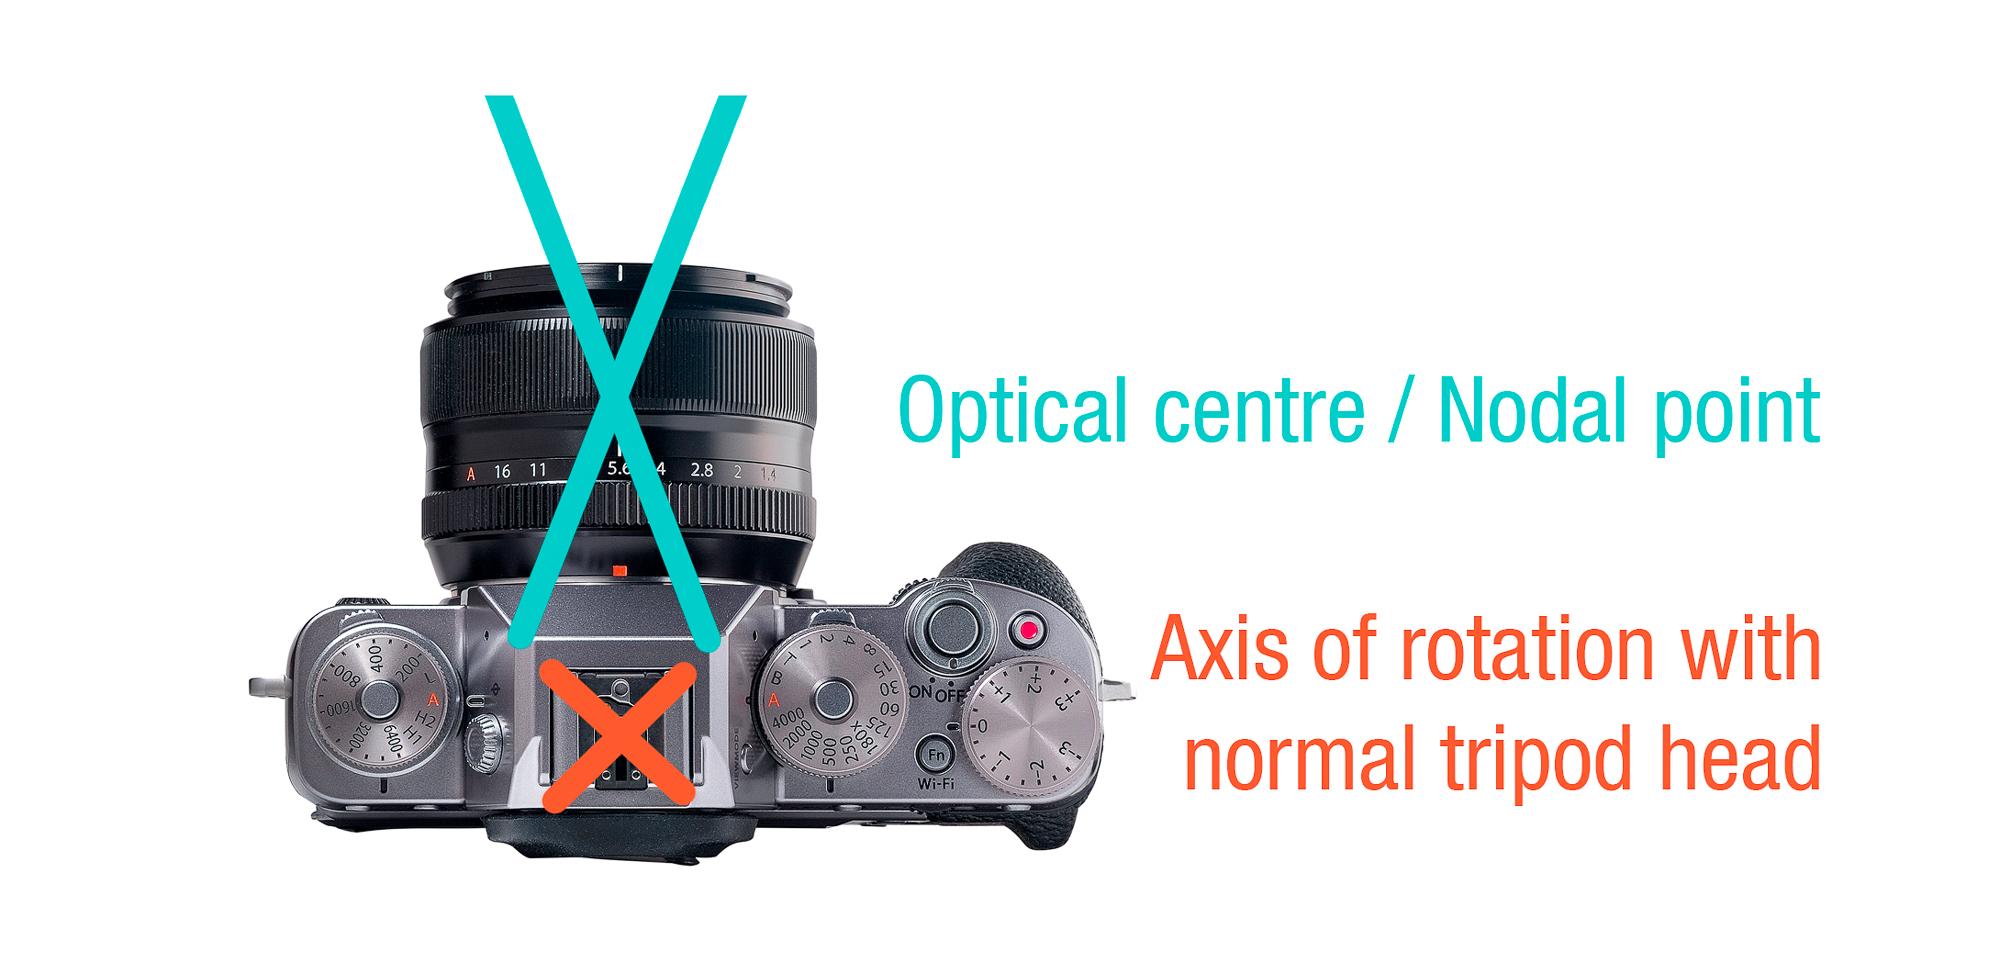 novoflex-vr-slim-review-nodalpoint.jpg